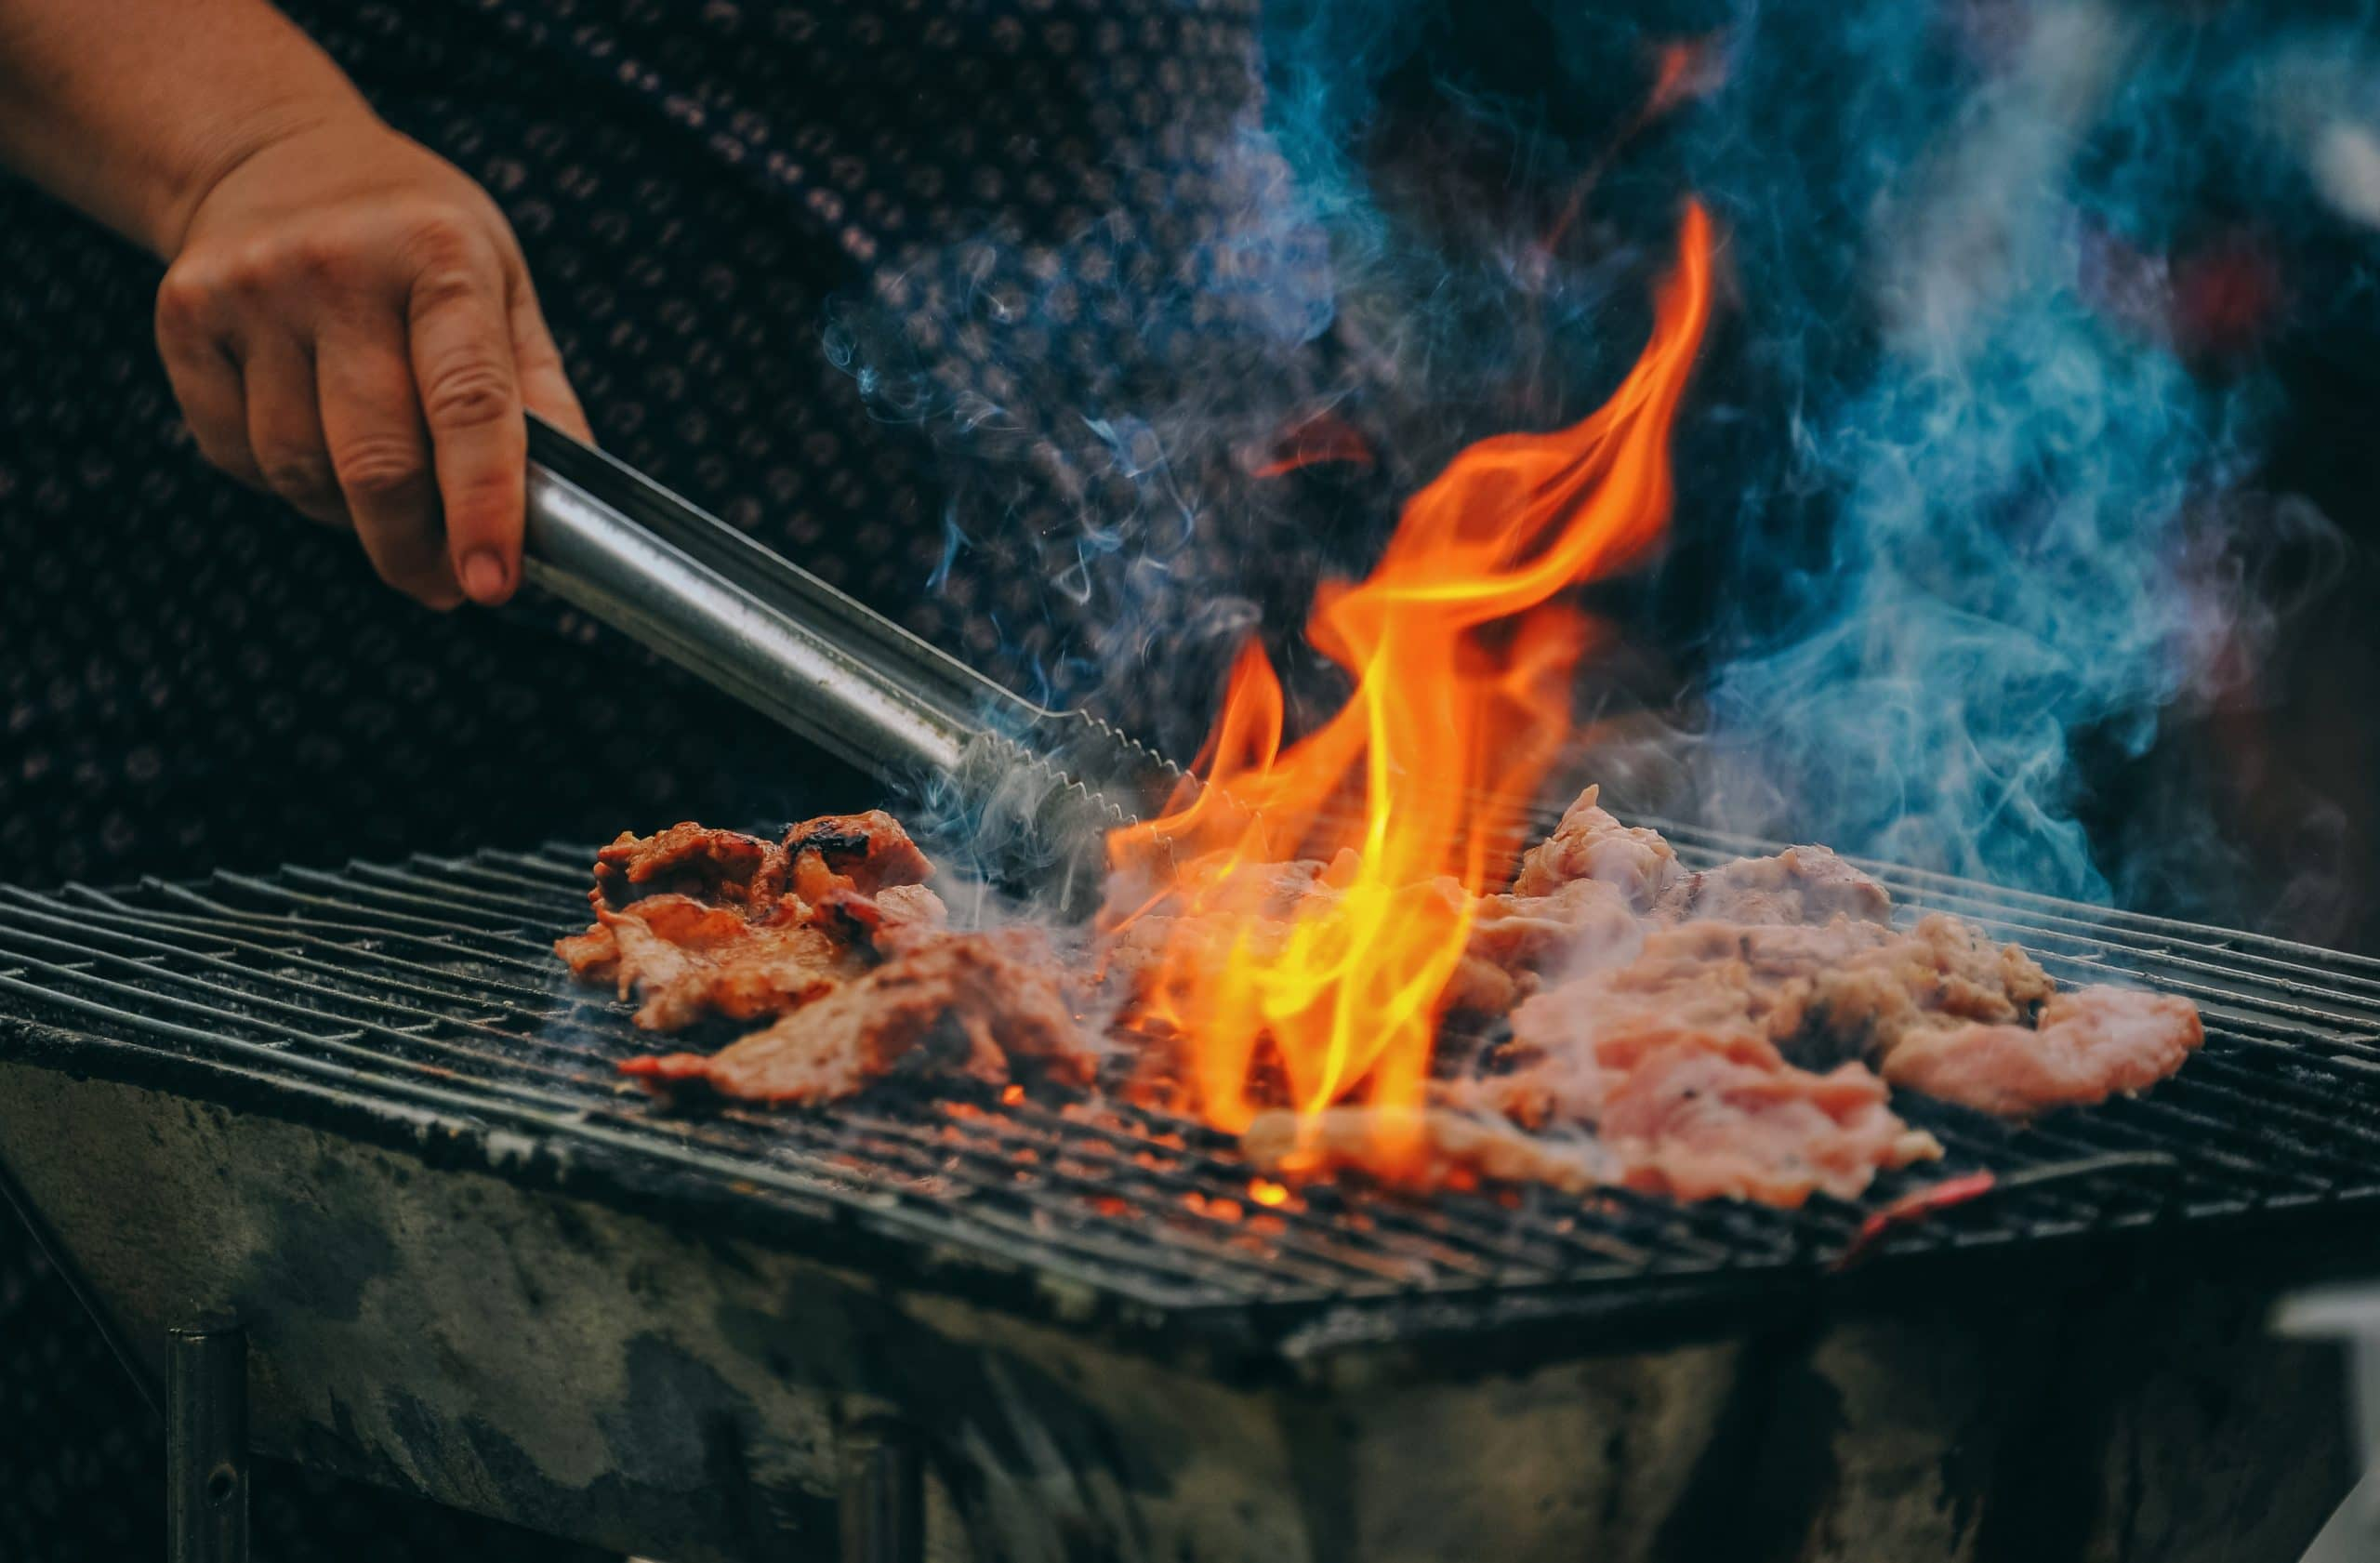 Churrasqueira queimando carne